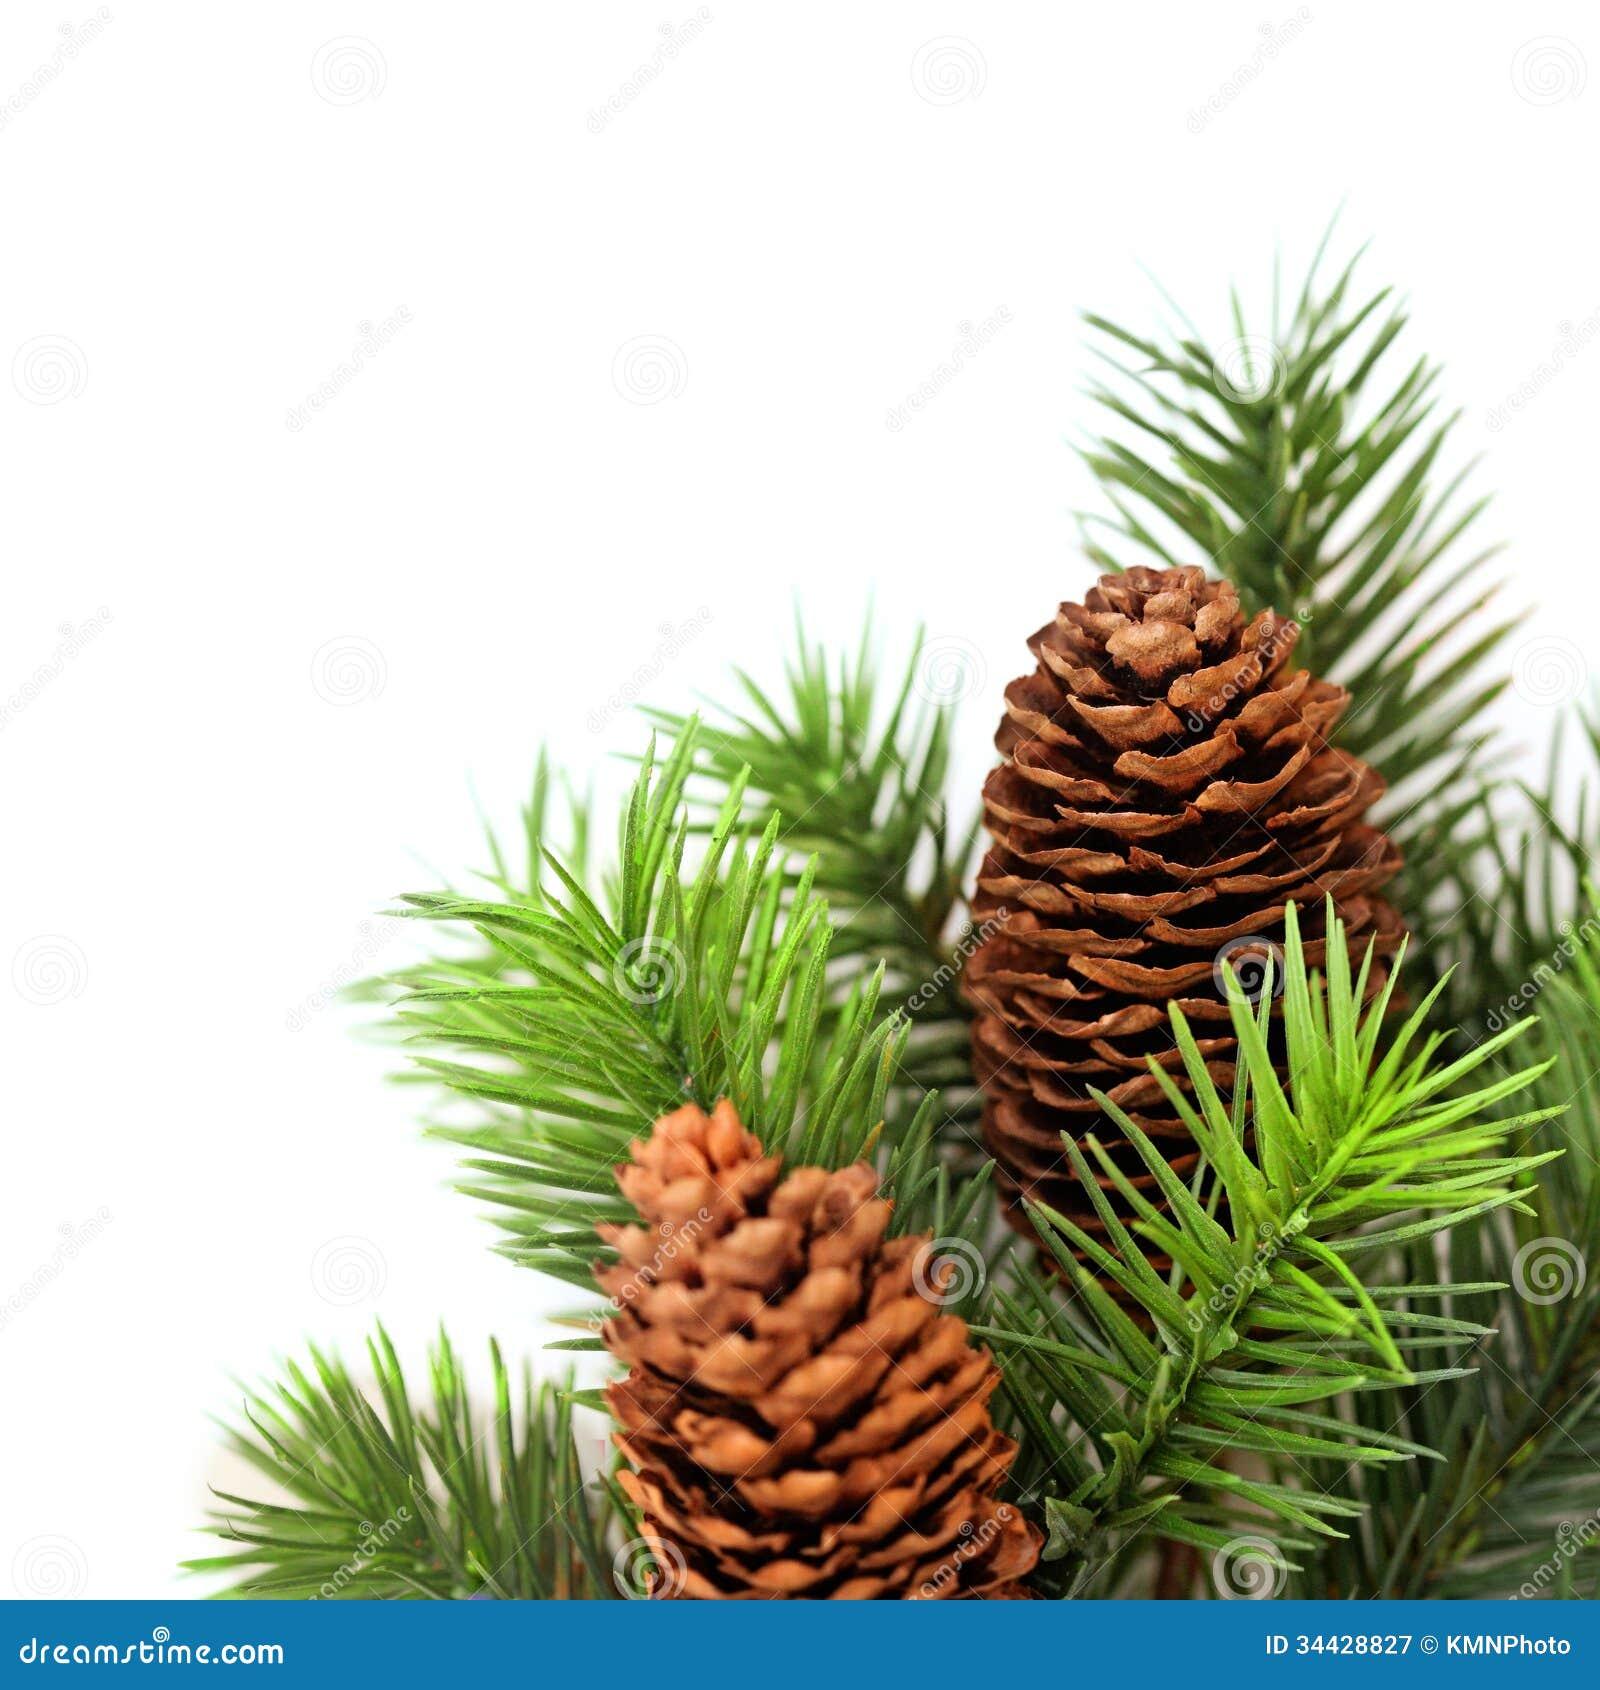 Christmas tree branches stock image. Image of plant, xmas ...